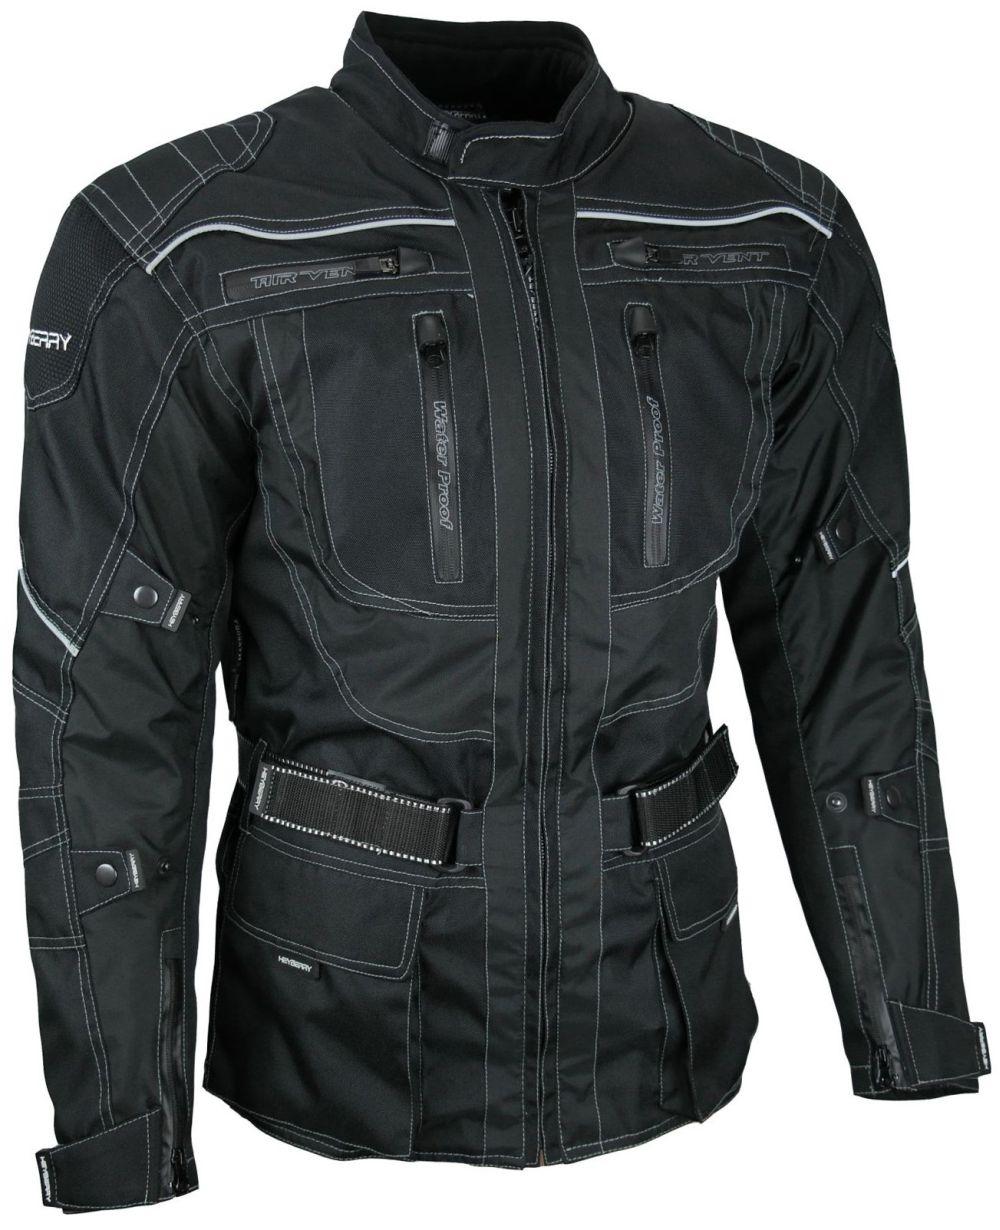 Heyberry Touren Motorrad Jacke Motorradjacke Textil schwarz Gr. M - 3XL